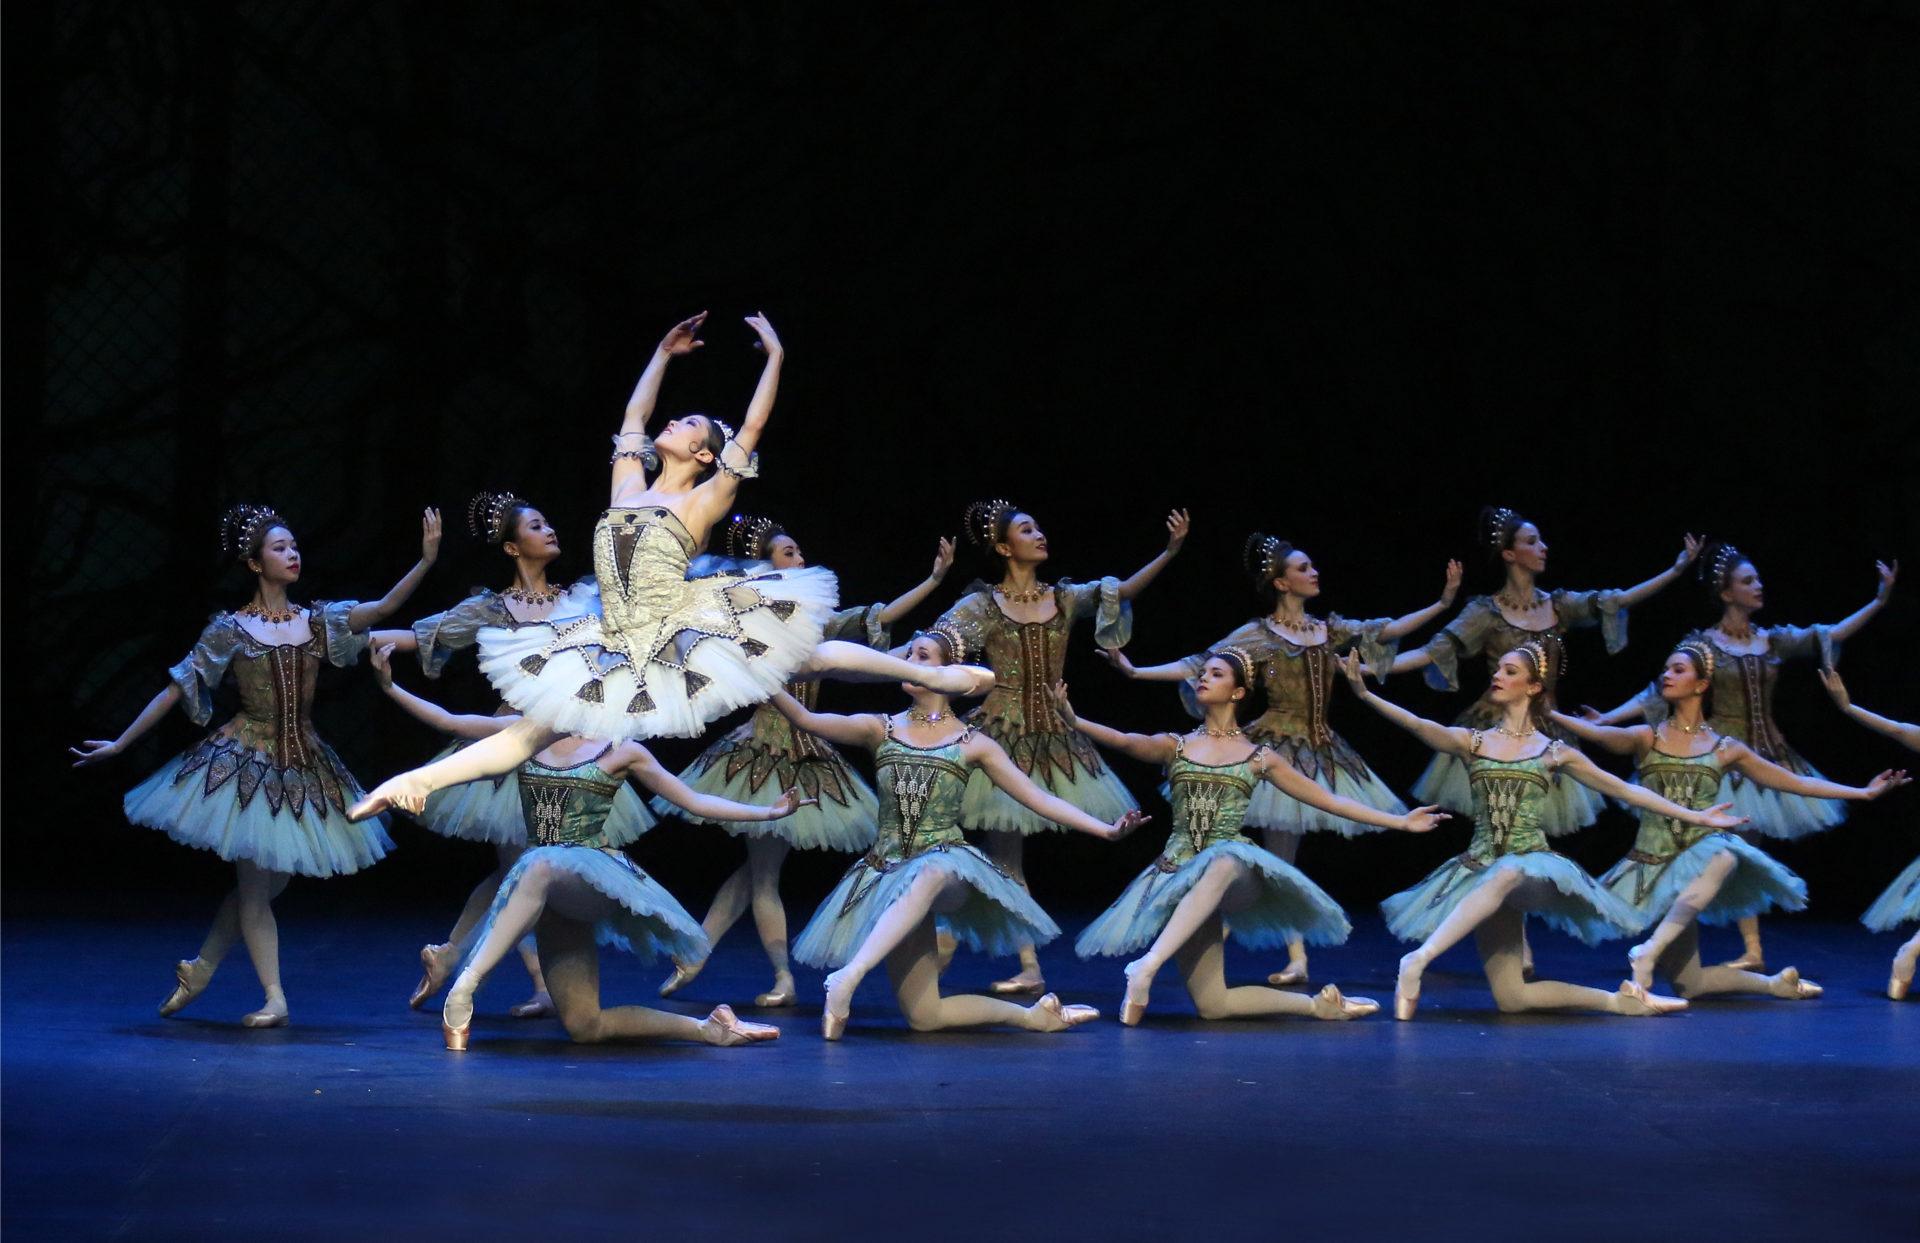 Don_Quixote_HH_Ballett_Foto_AnjaBeutler.de_516